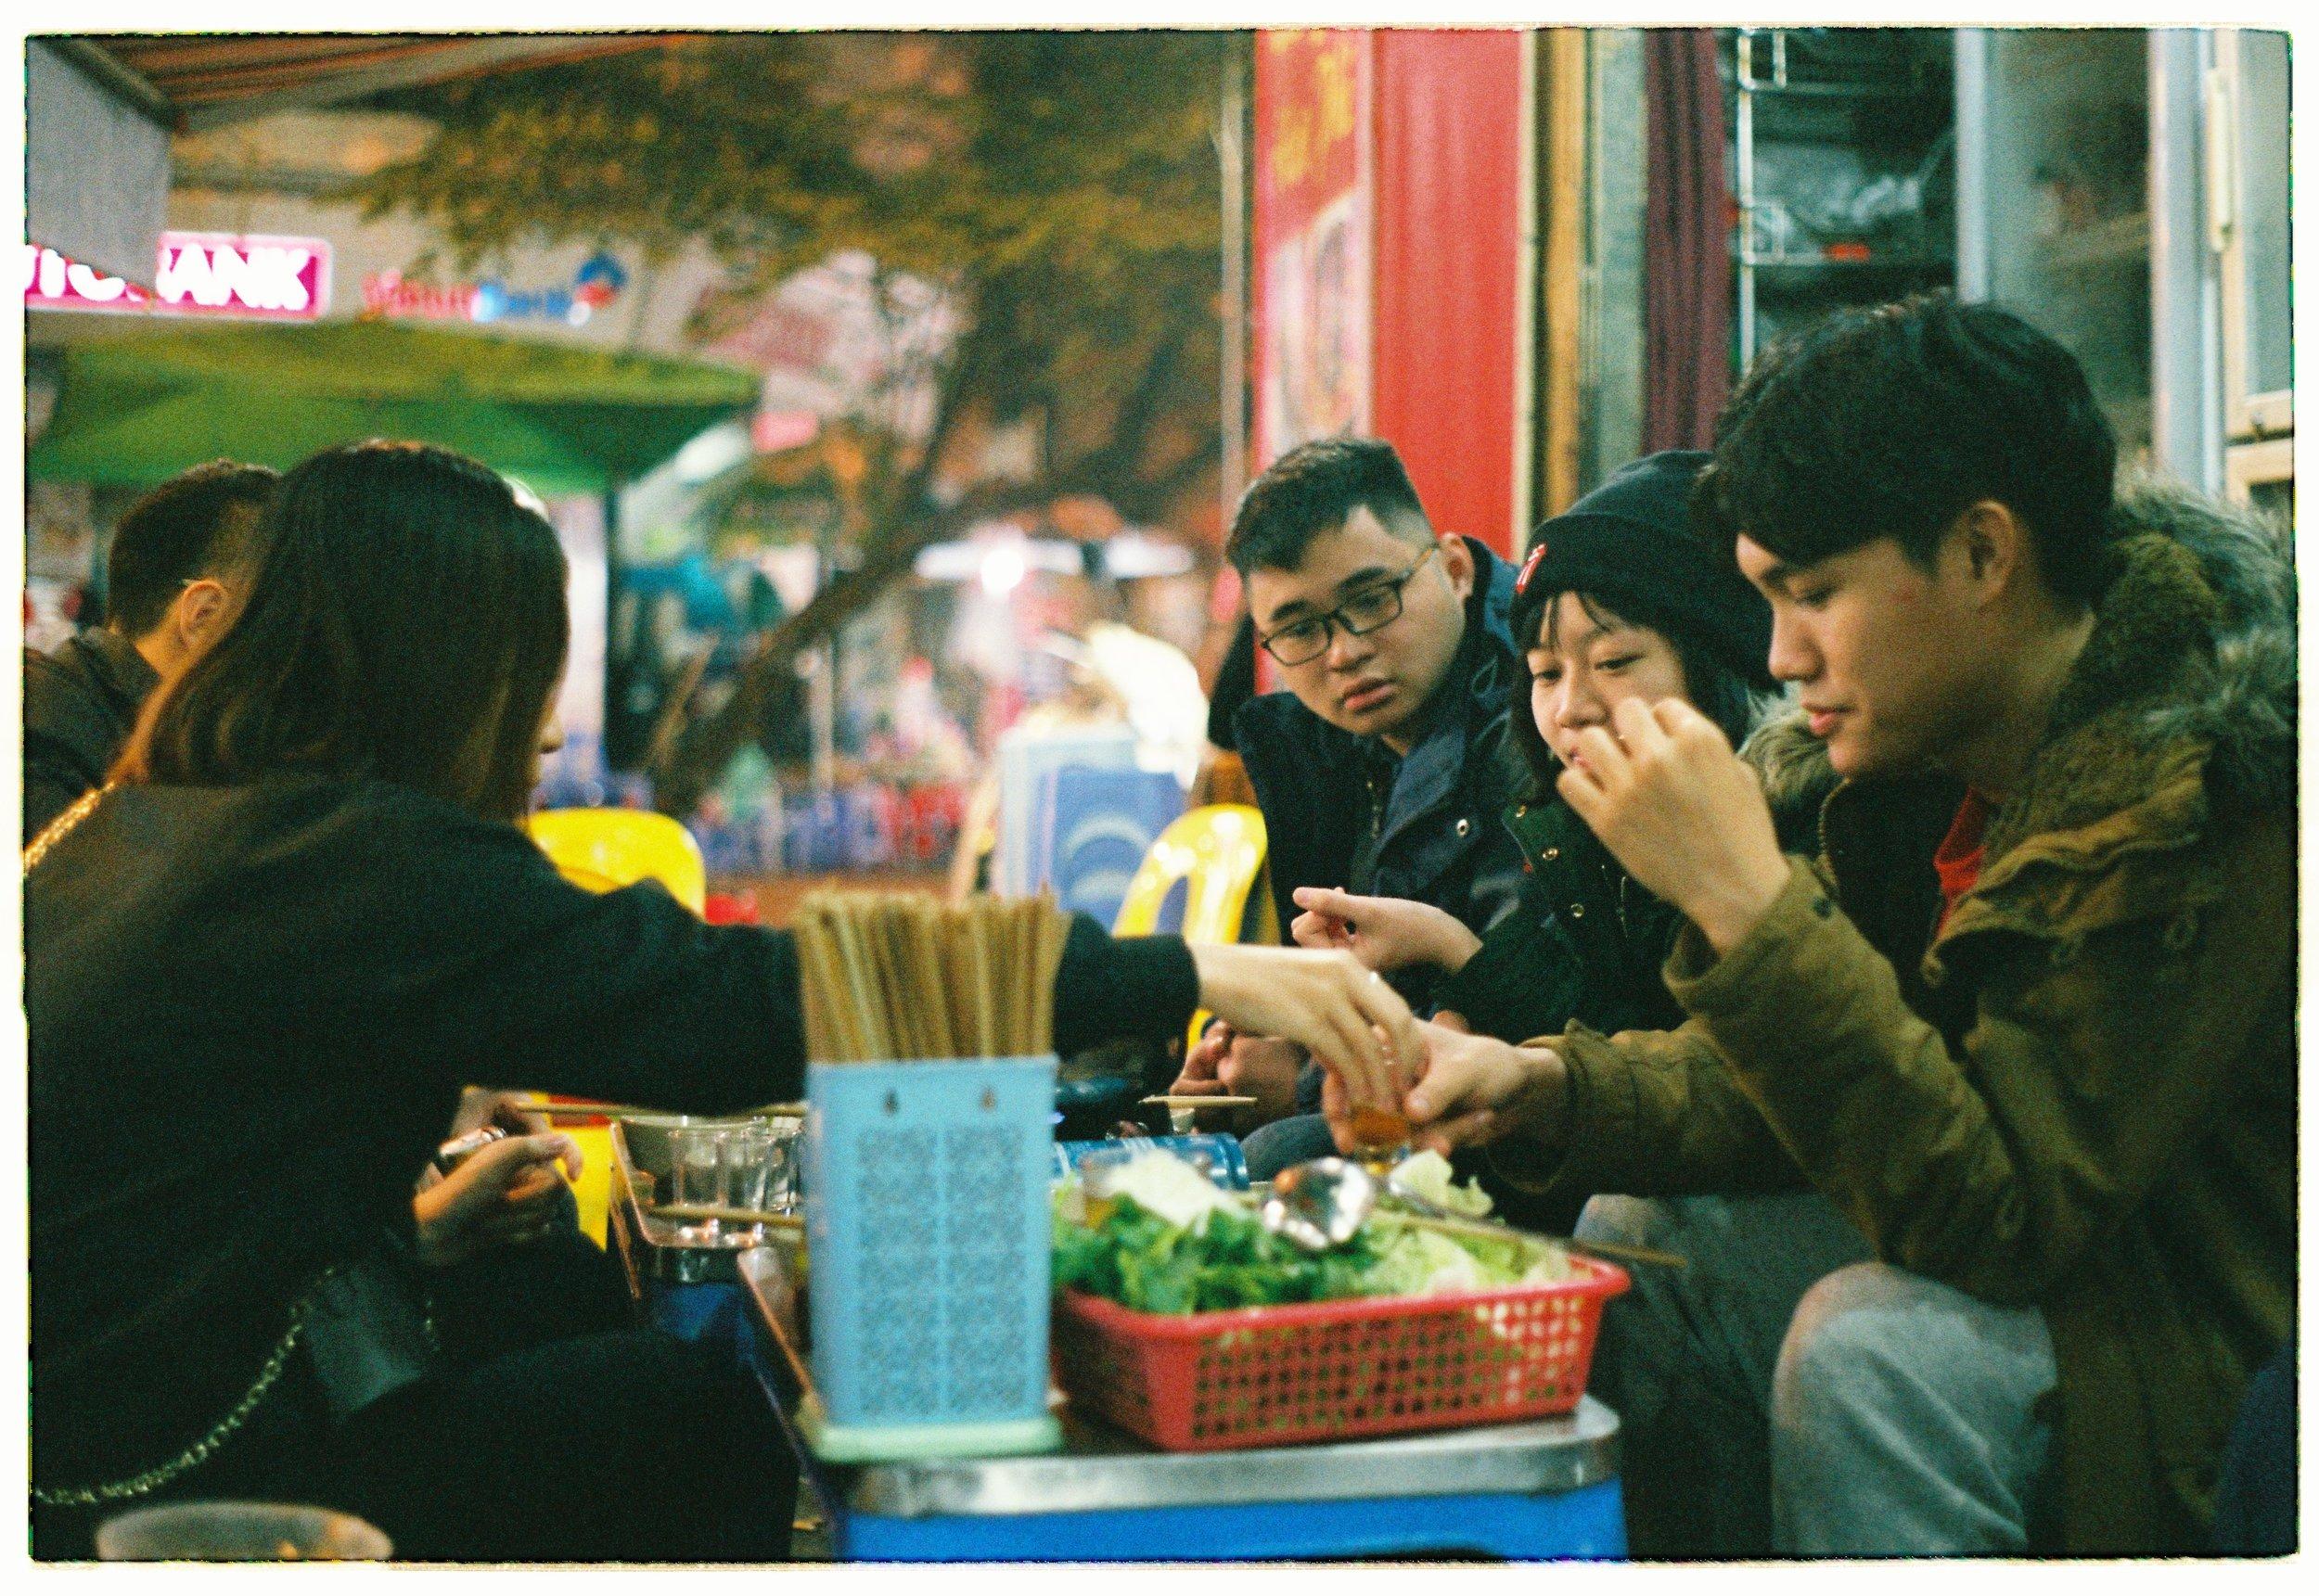 Street food culture in Vietnam.